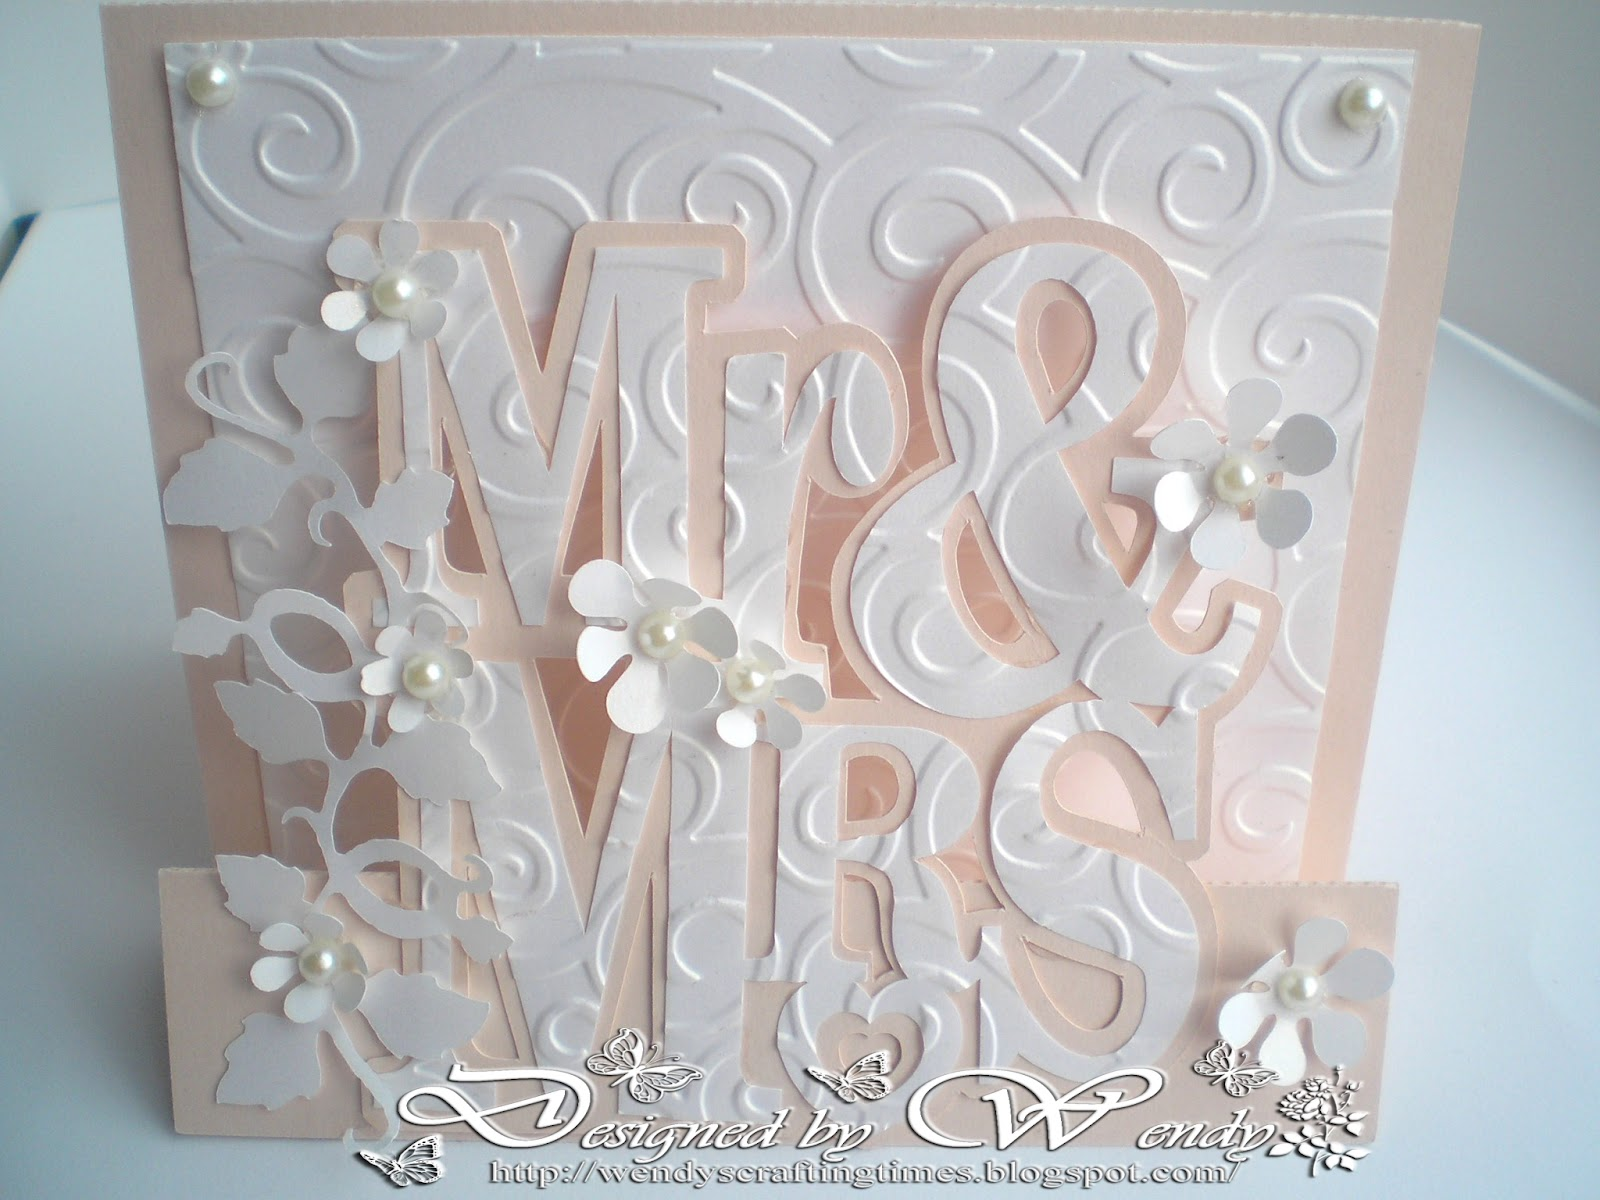 Jingvitations cricut wedding anniversary